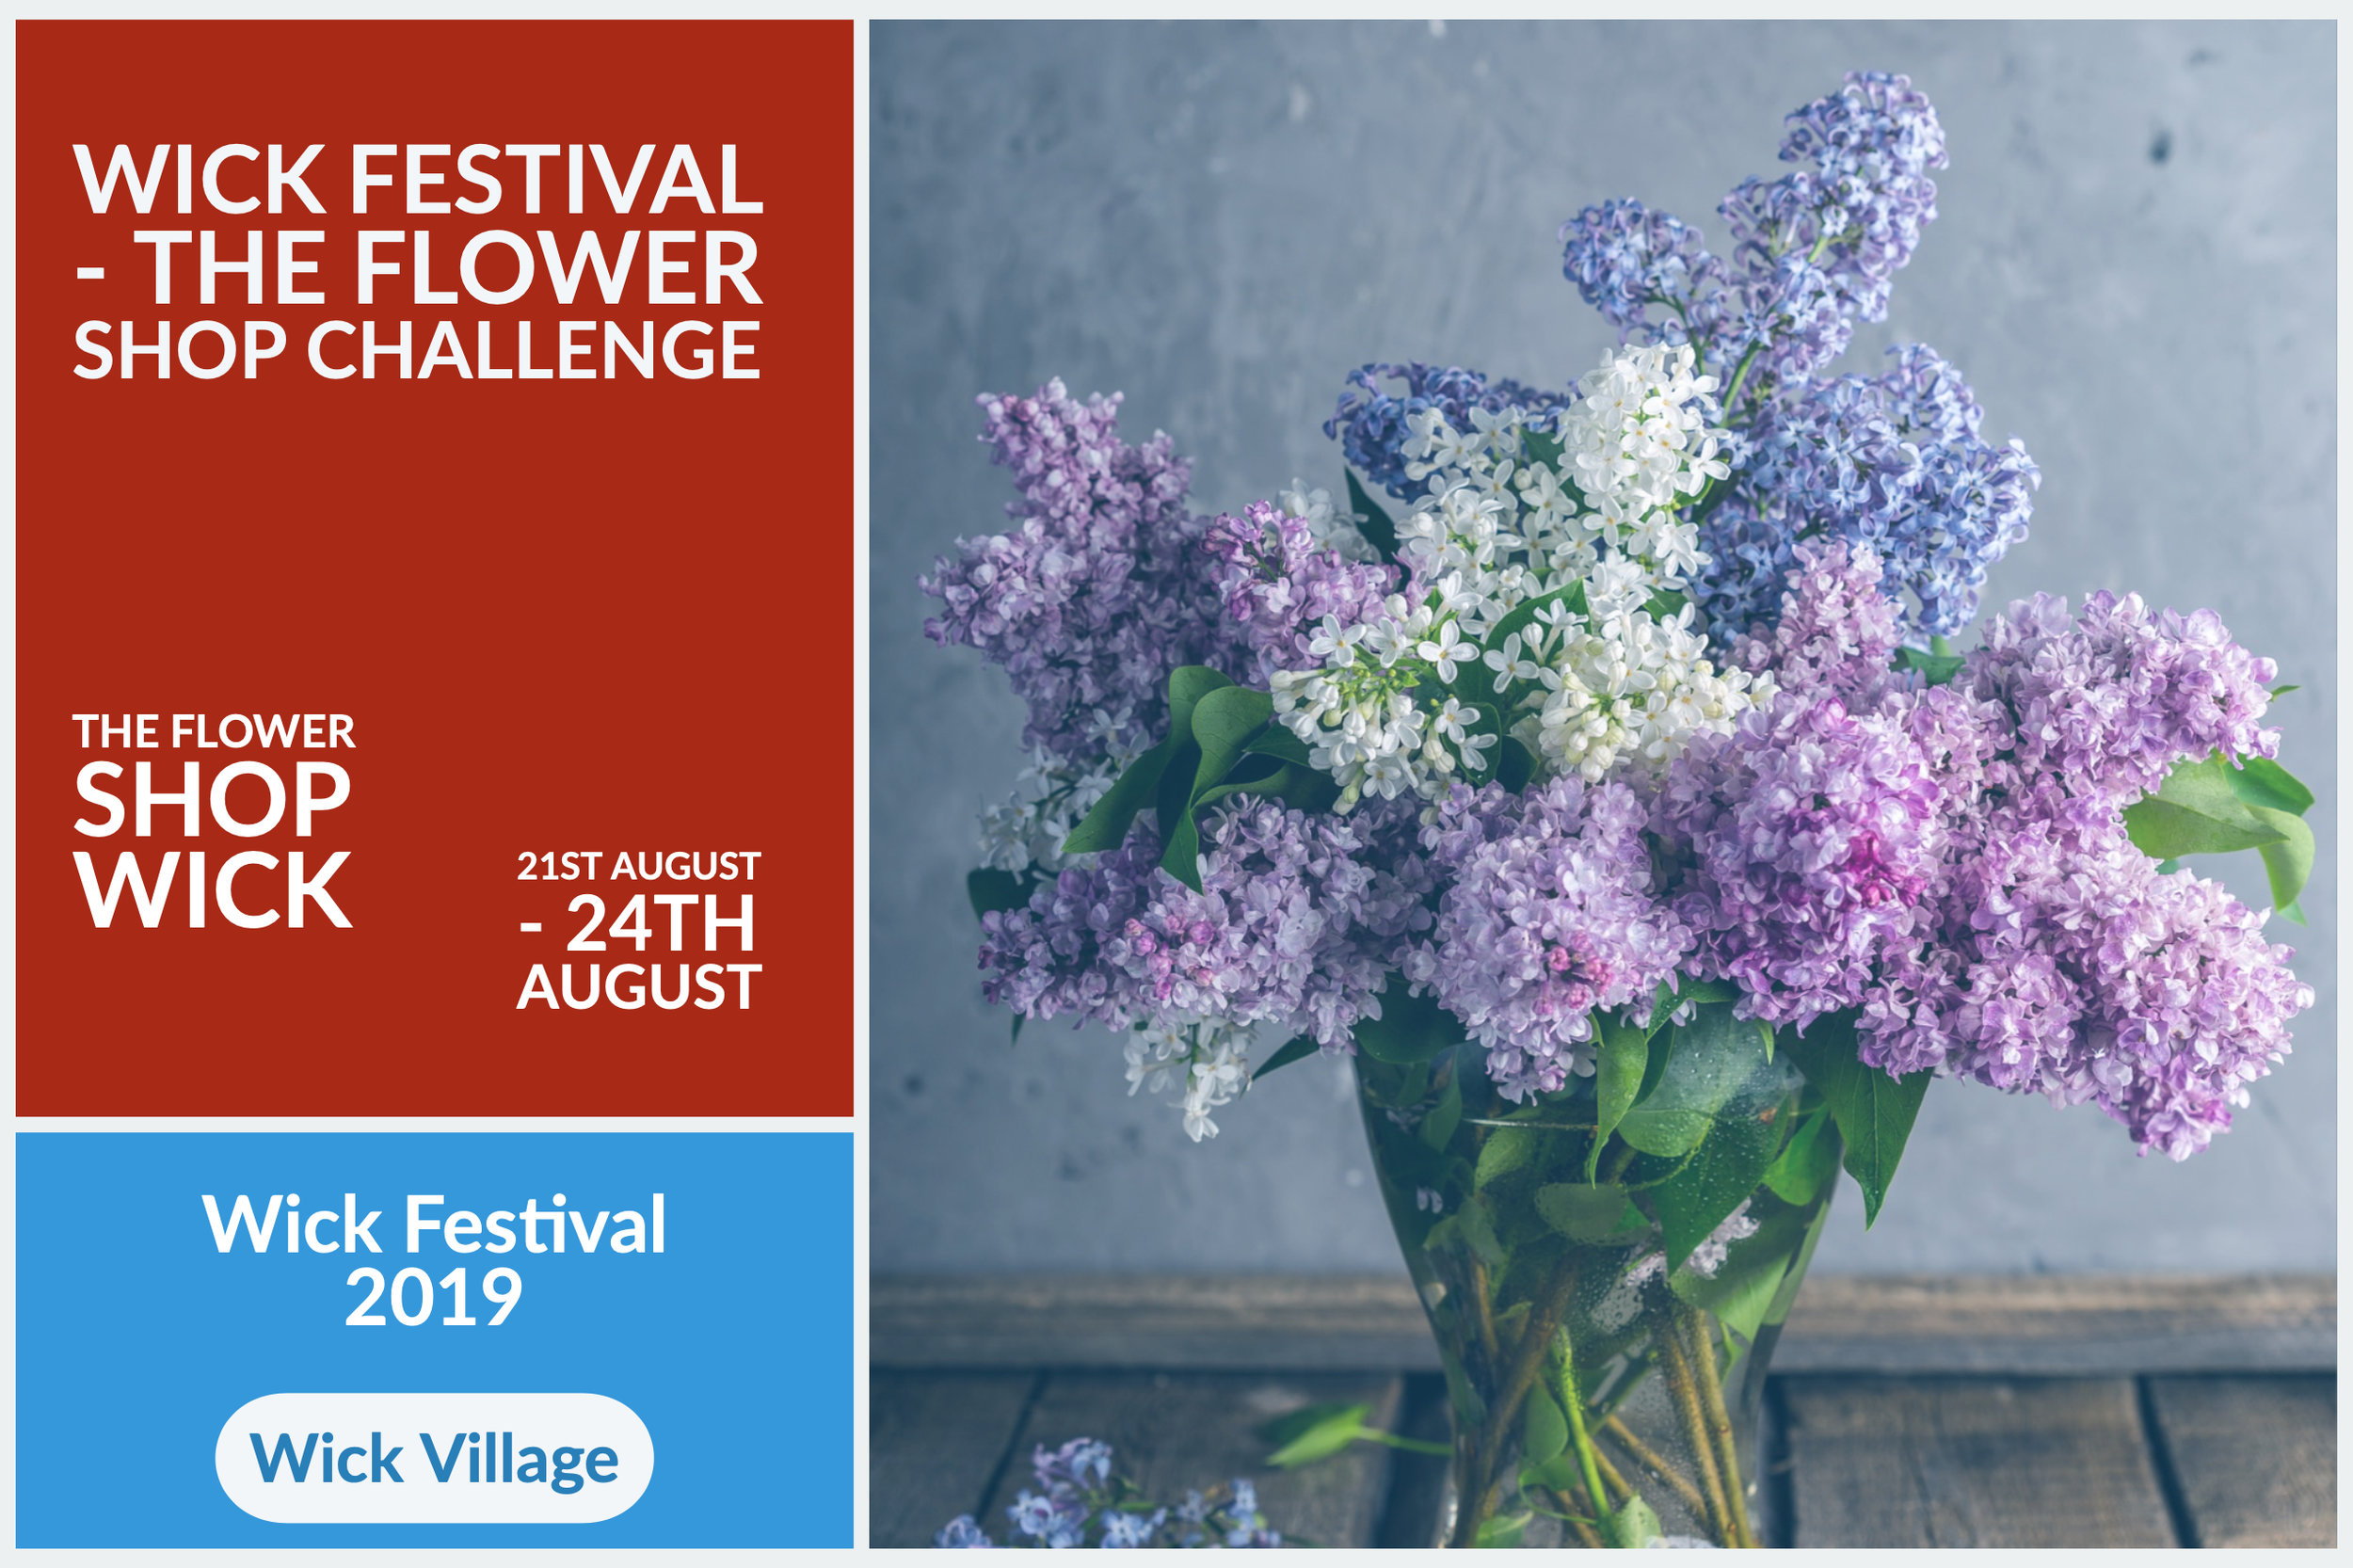 Wick Festival - The Flower Shop Challenge